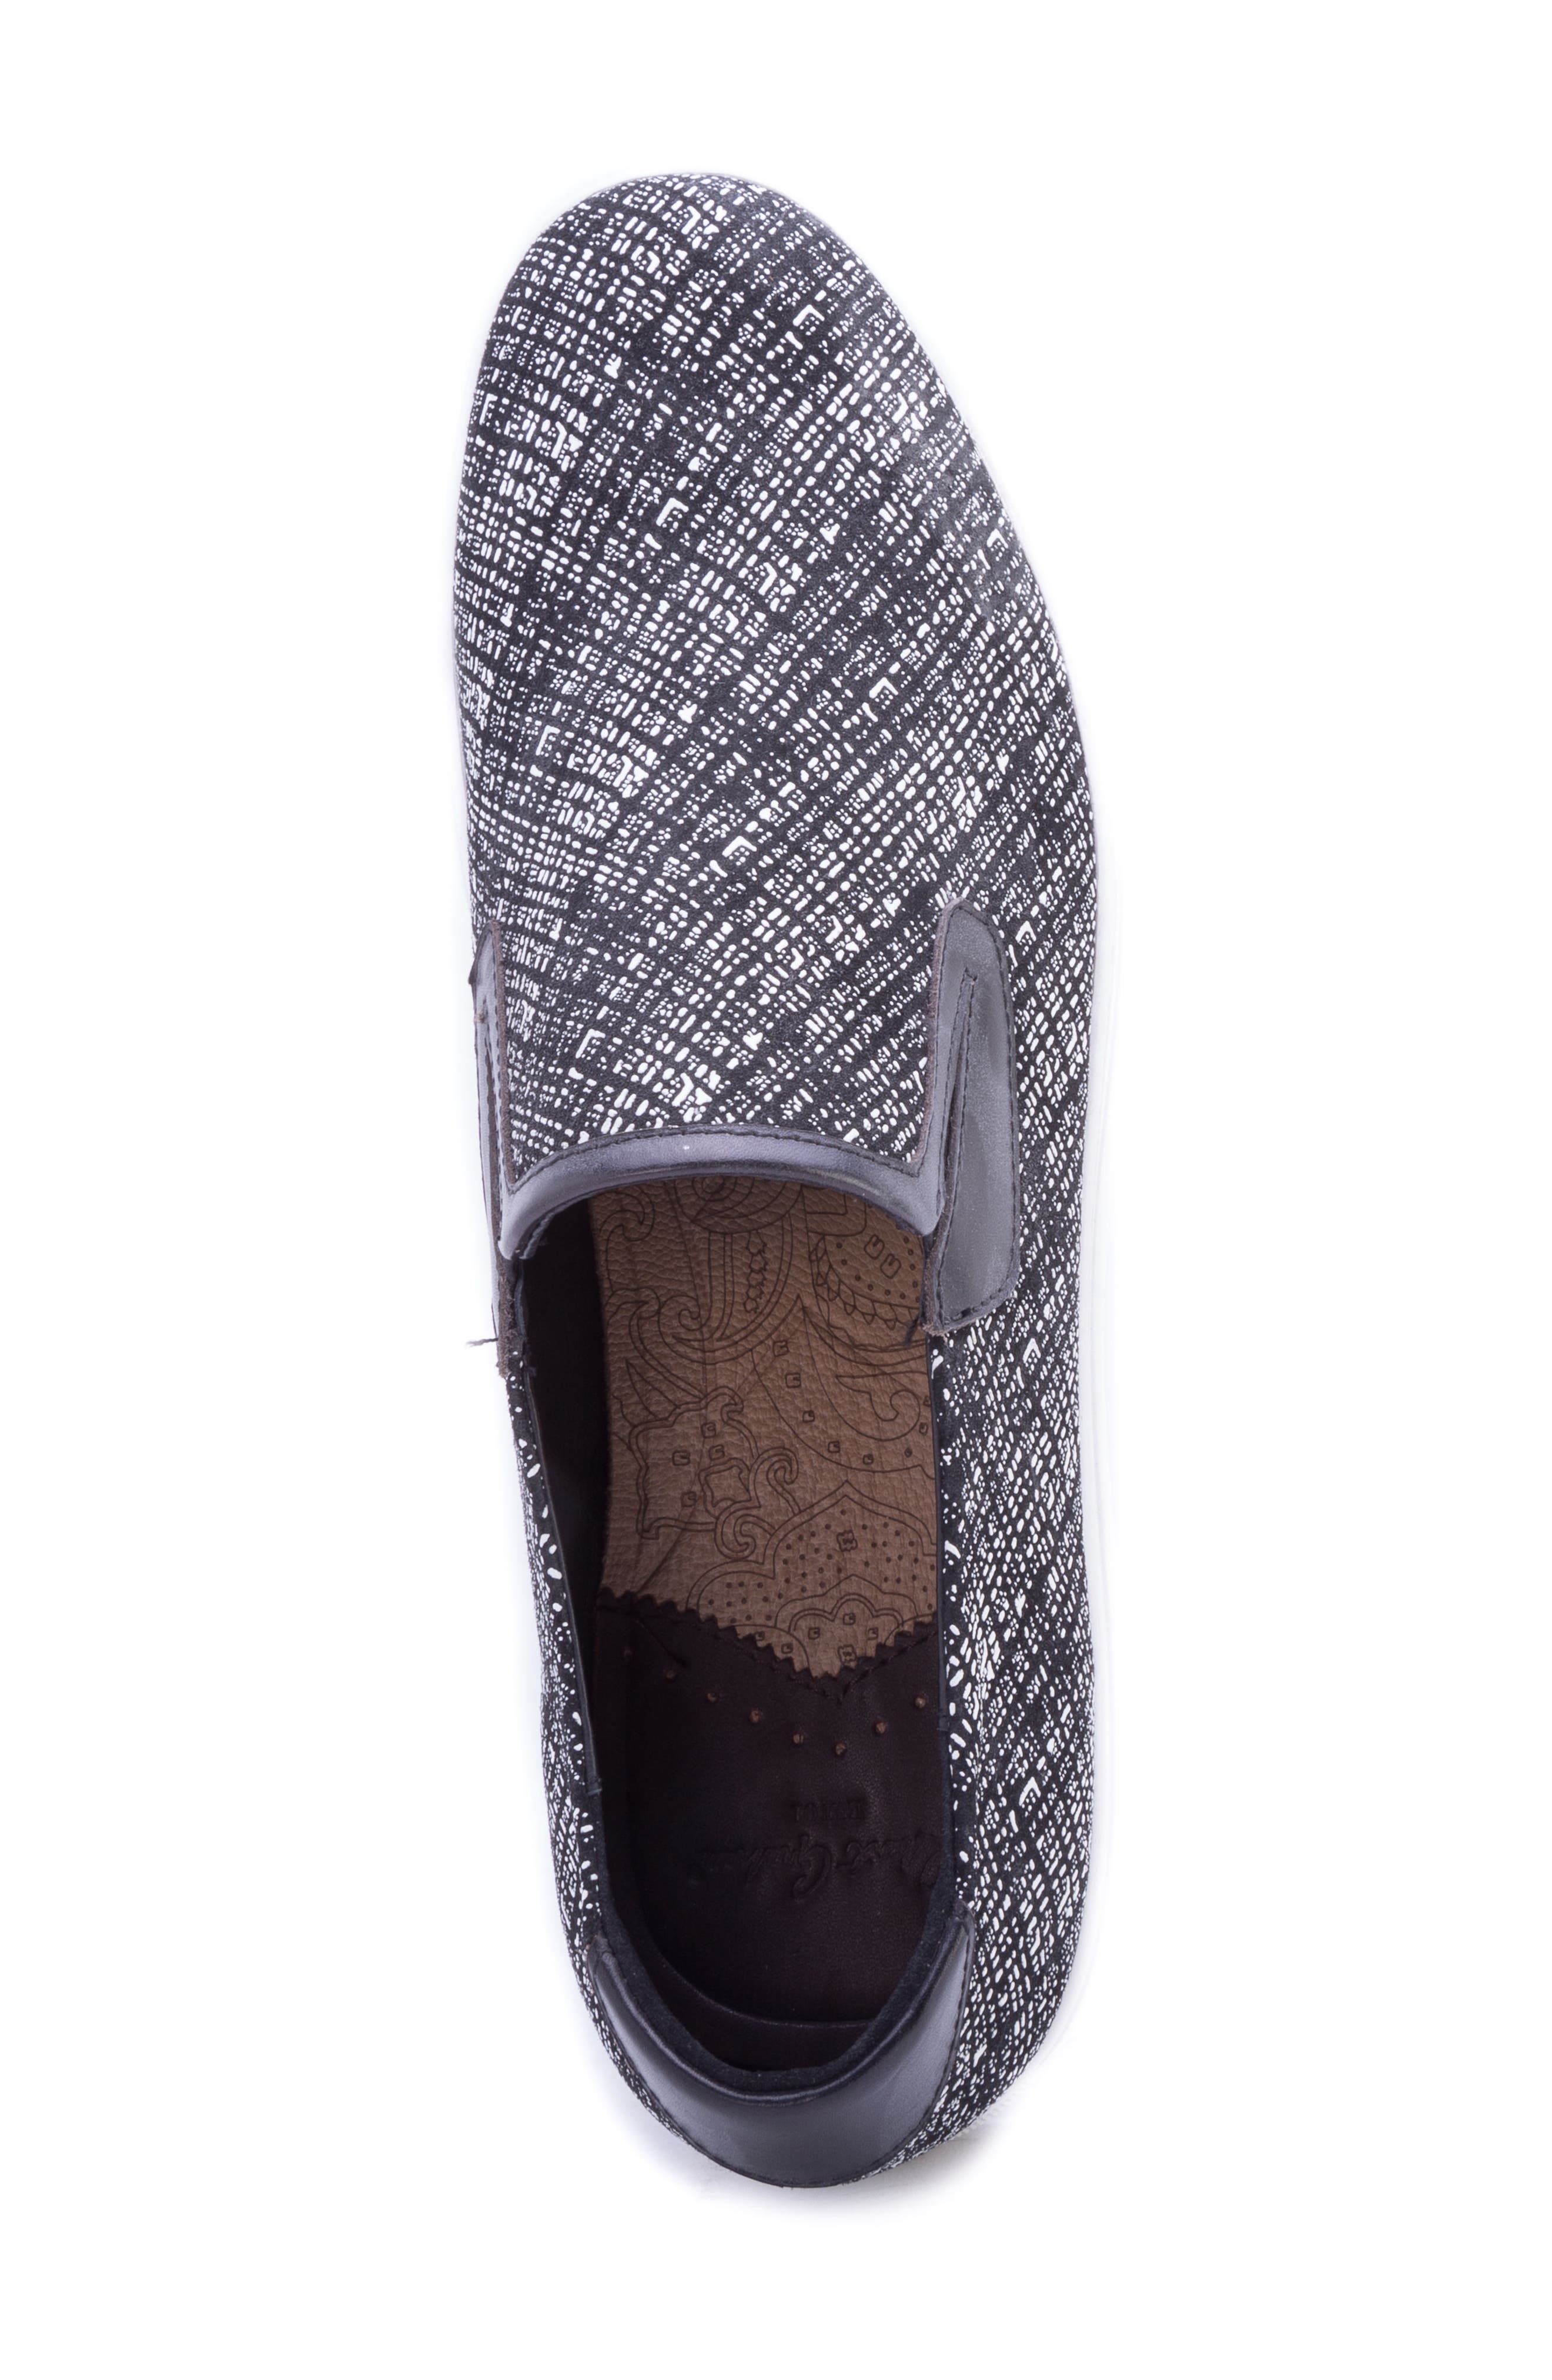 Kitson Slip-On Sneaker,                             Alternate thumbnail 5, color,                             BLACK SUEDE